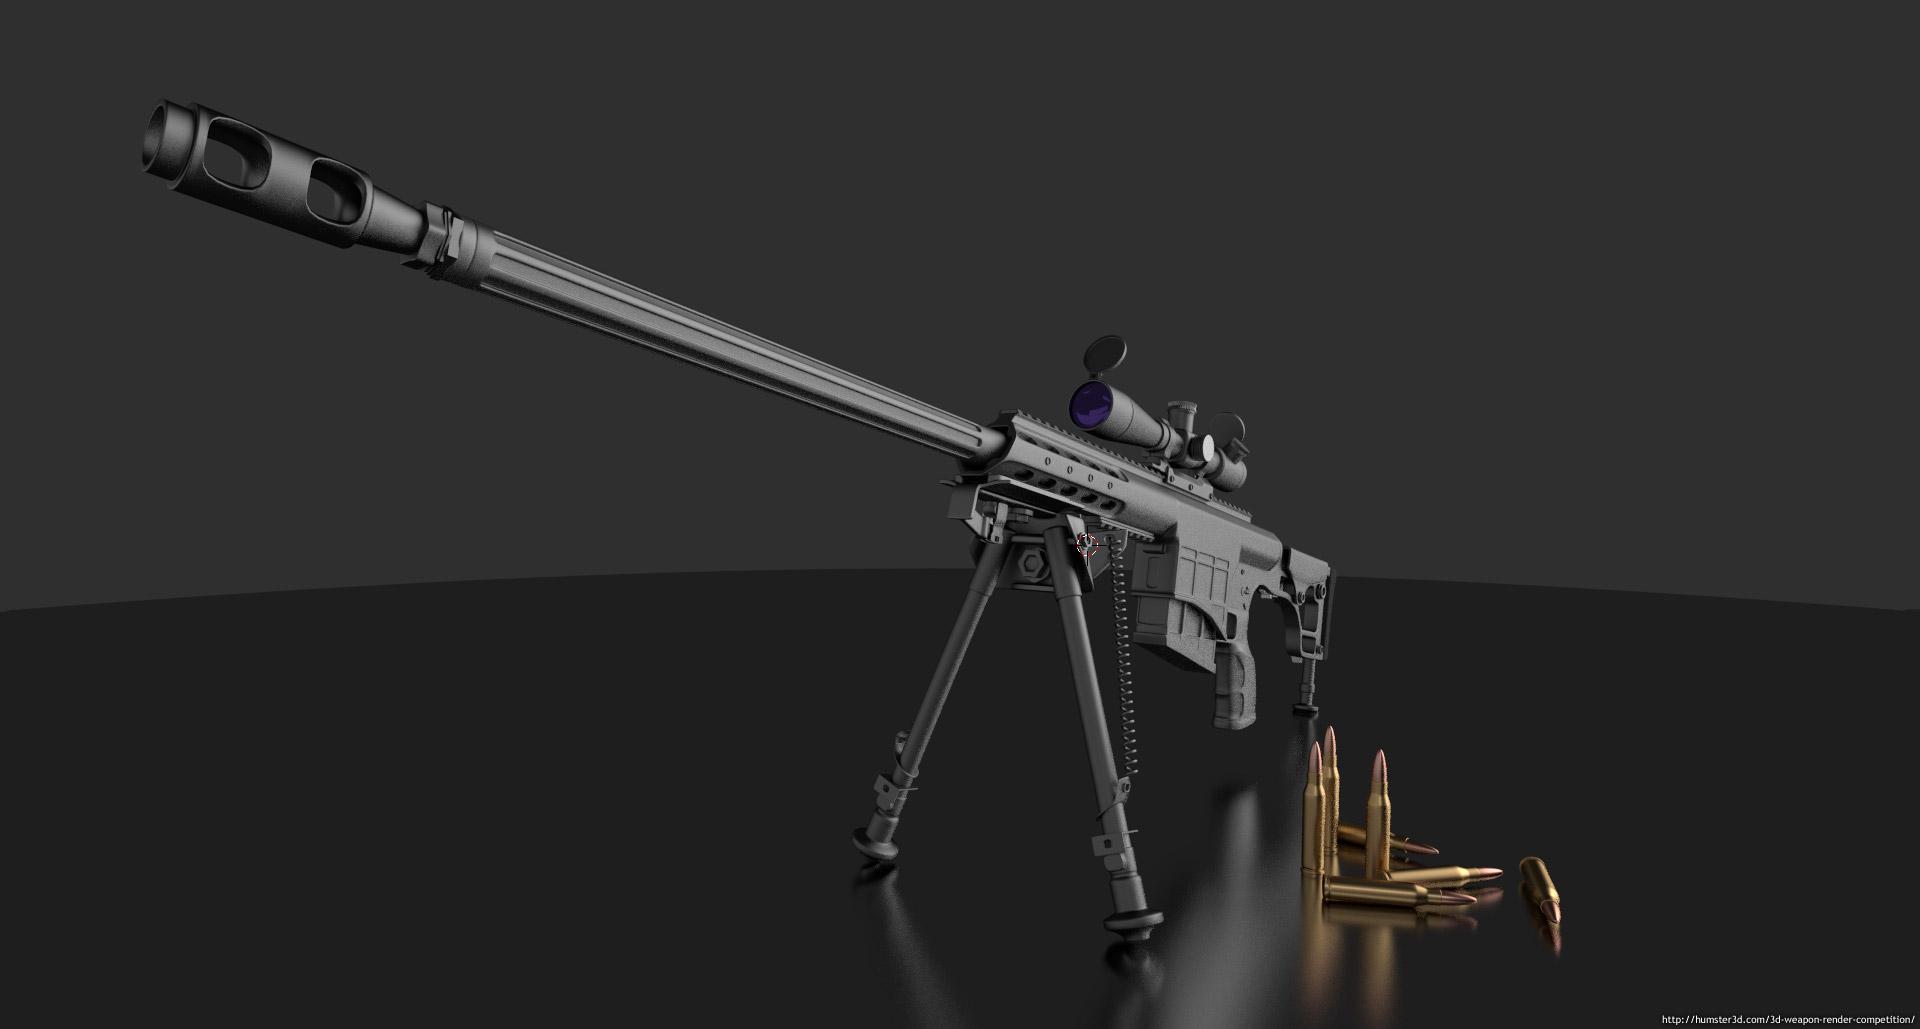 m98b sniper rifle - photo #1